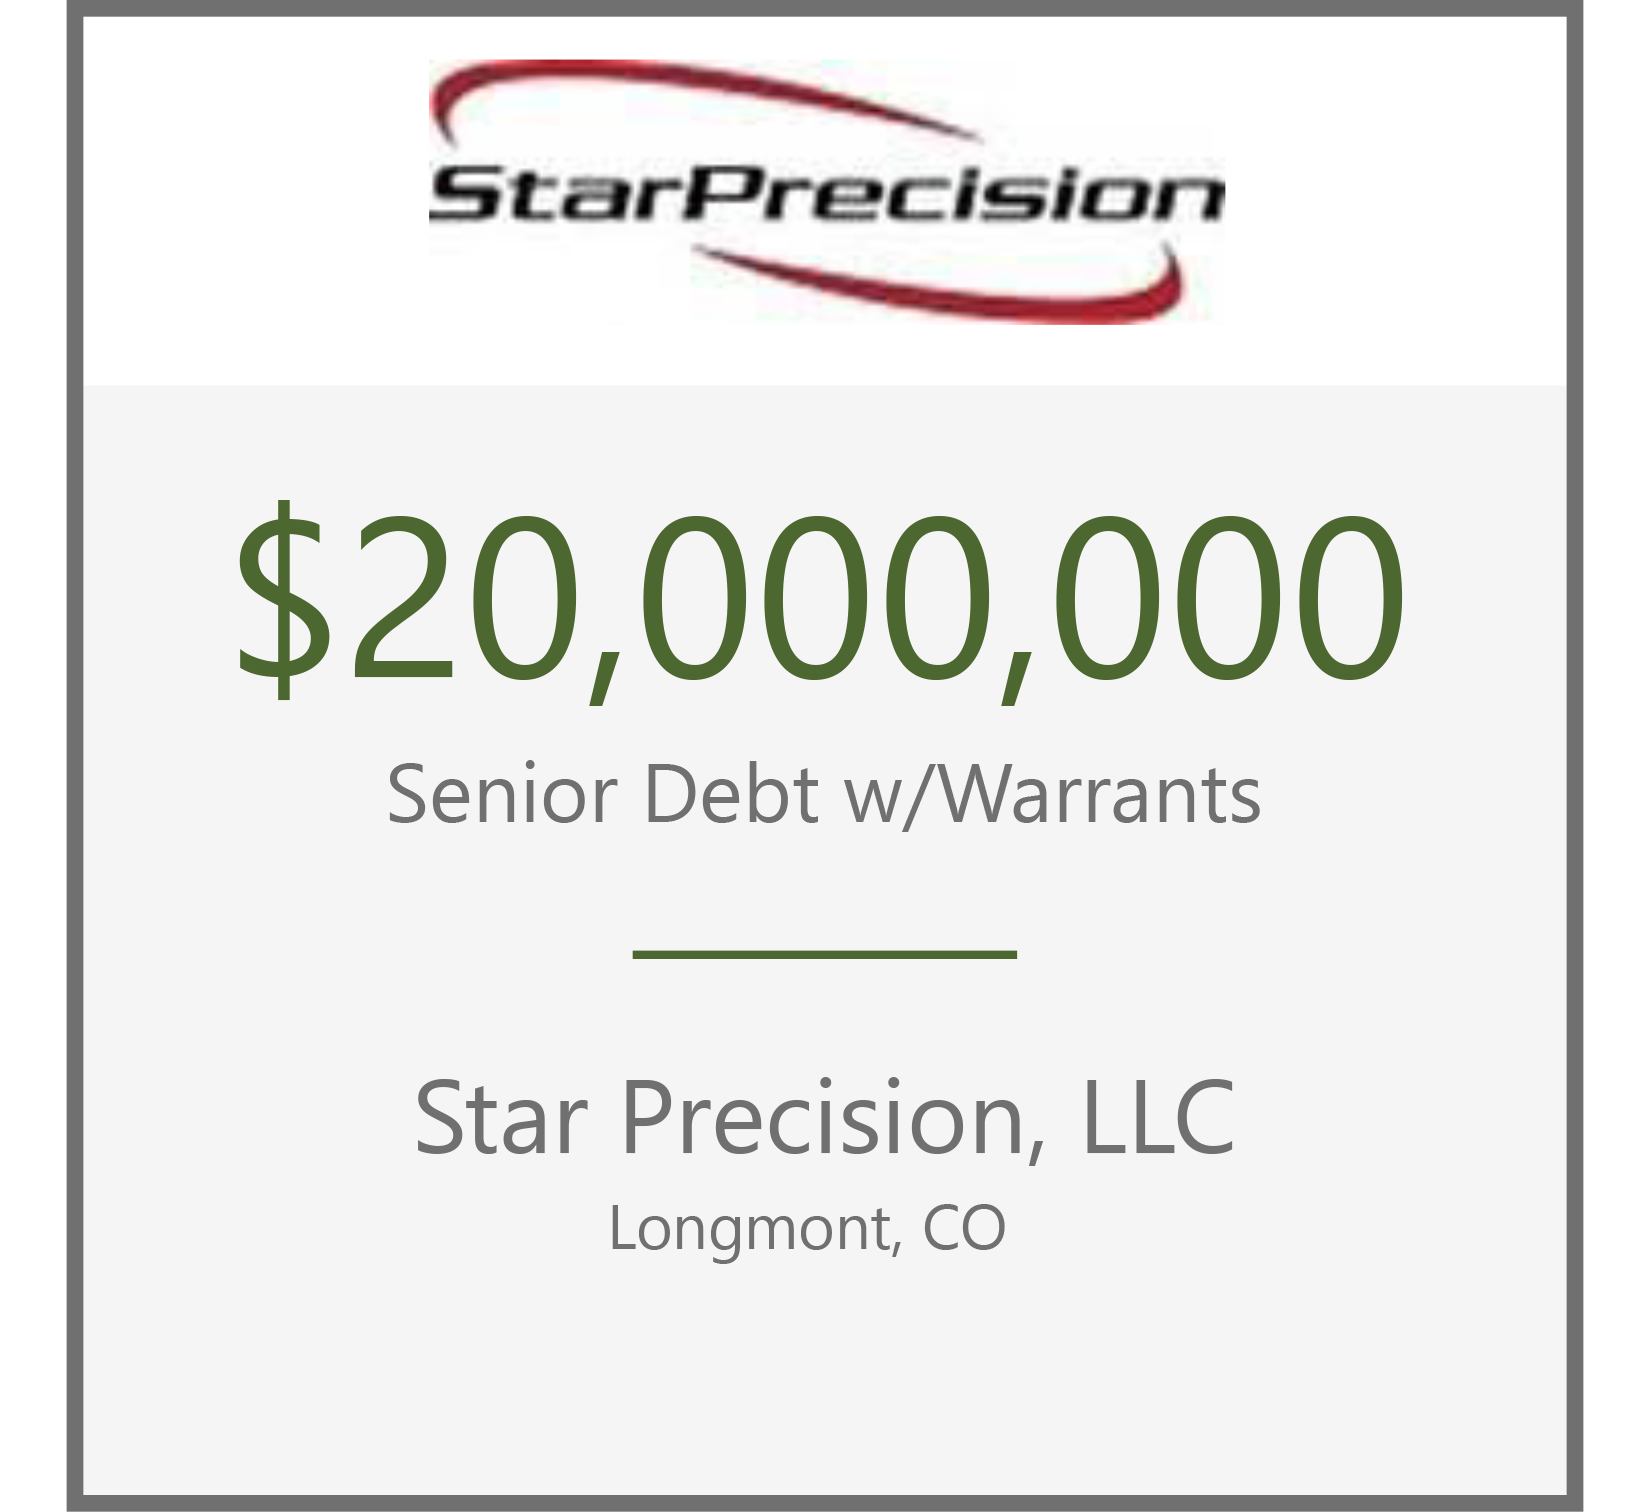 StarPrecision.png